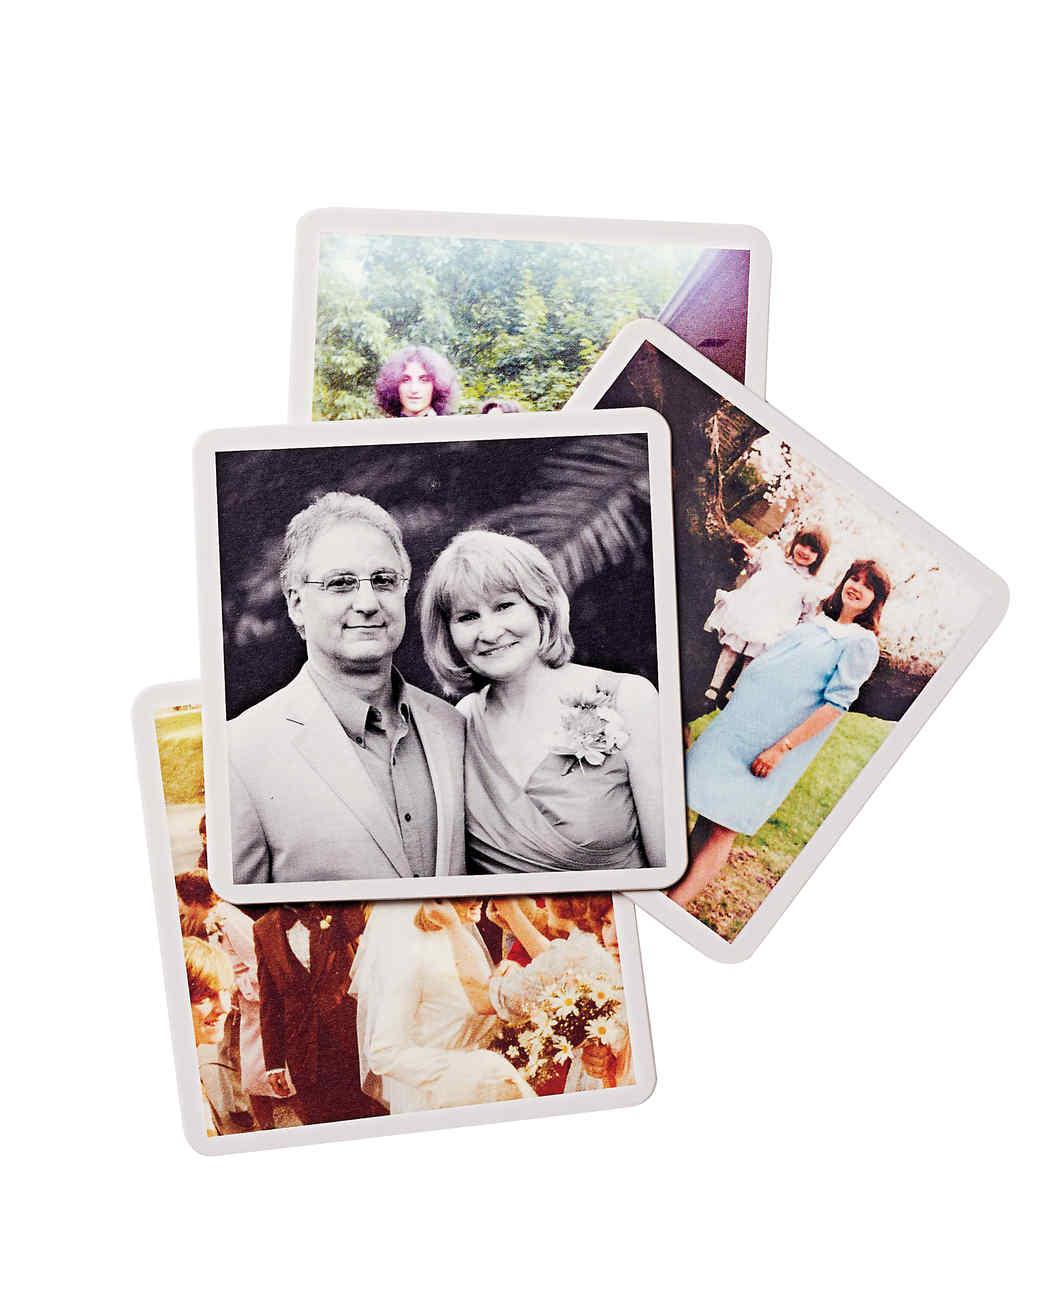 photo-coasters-pinhole-press-001-d111473.jpg